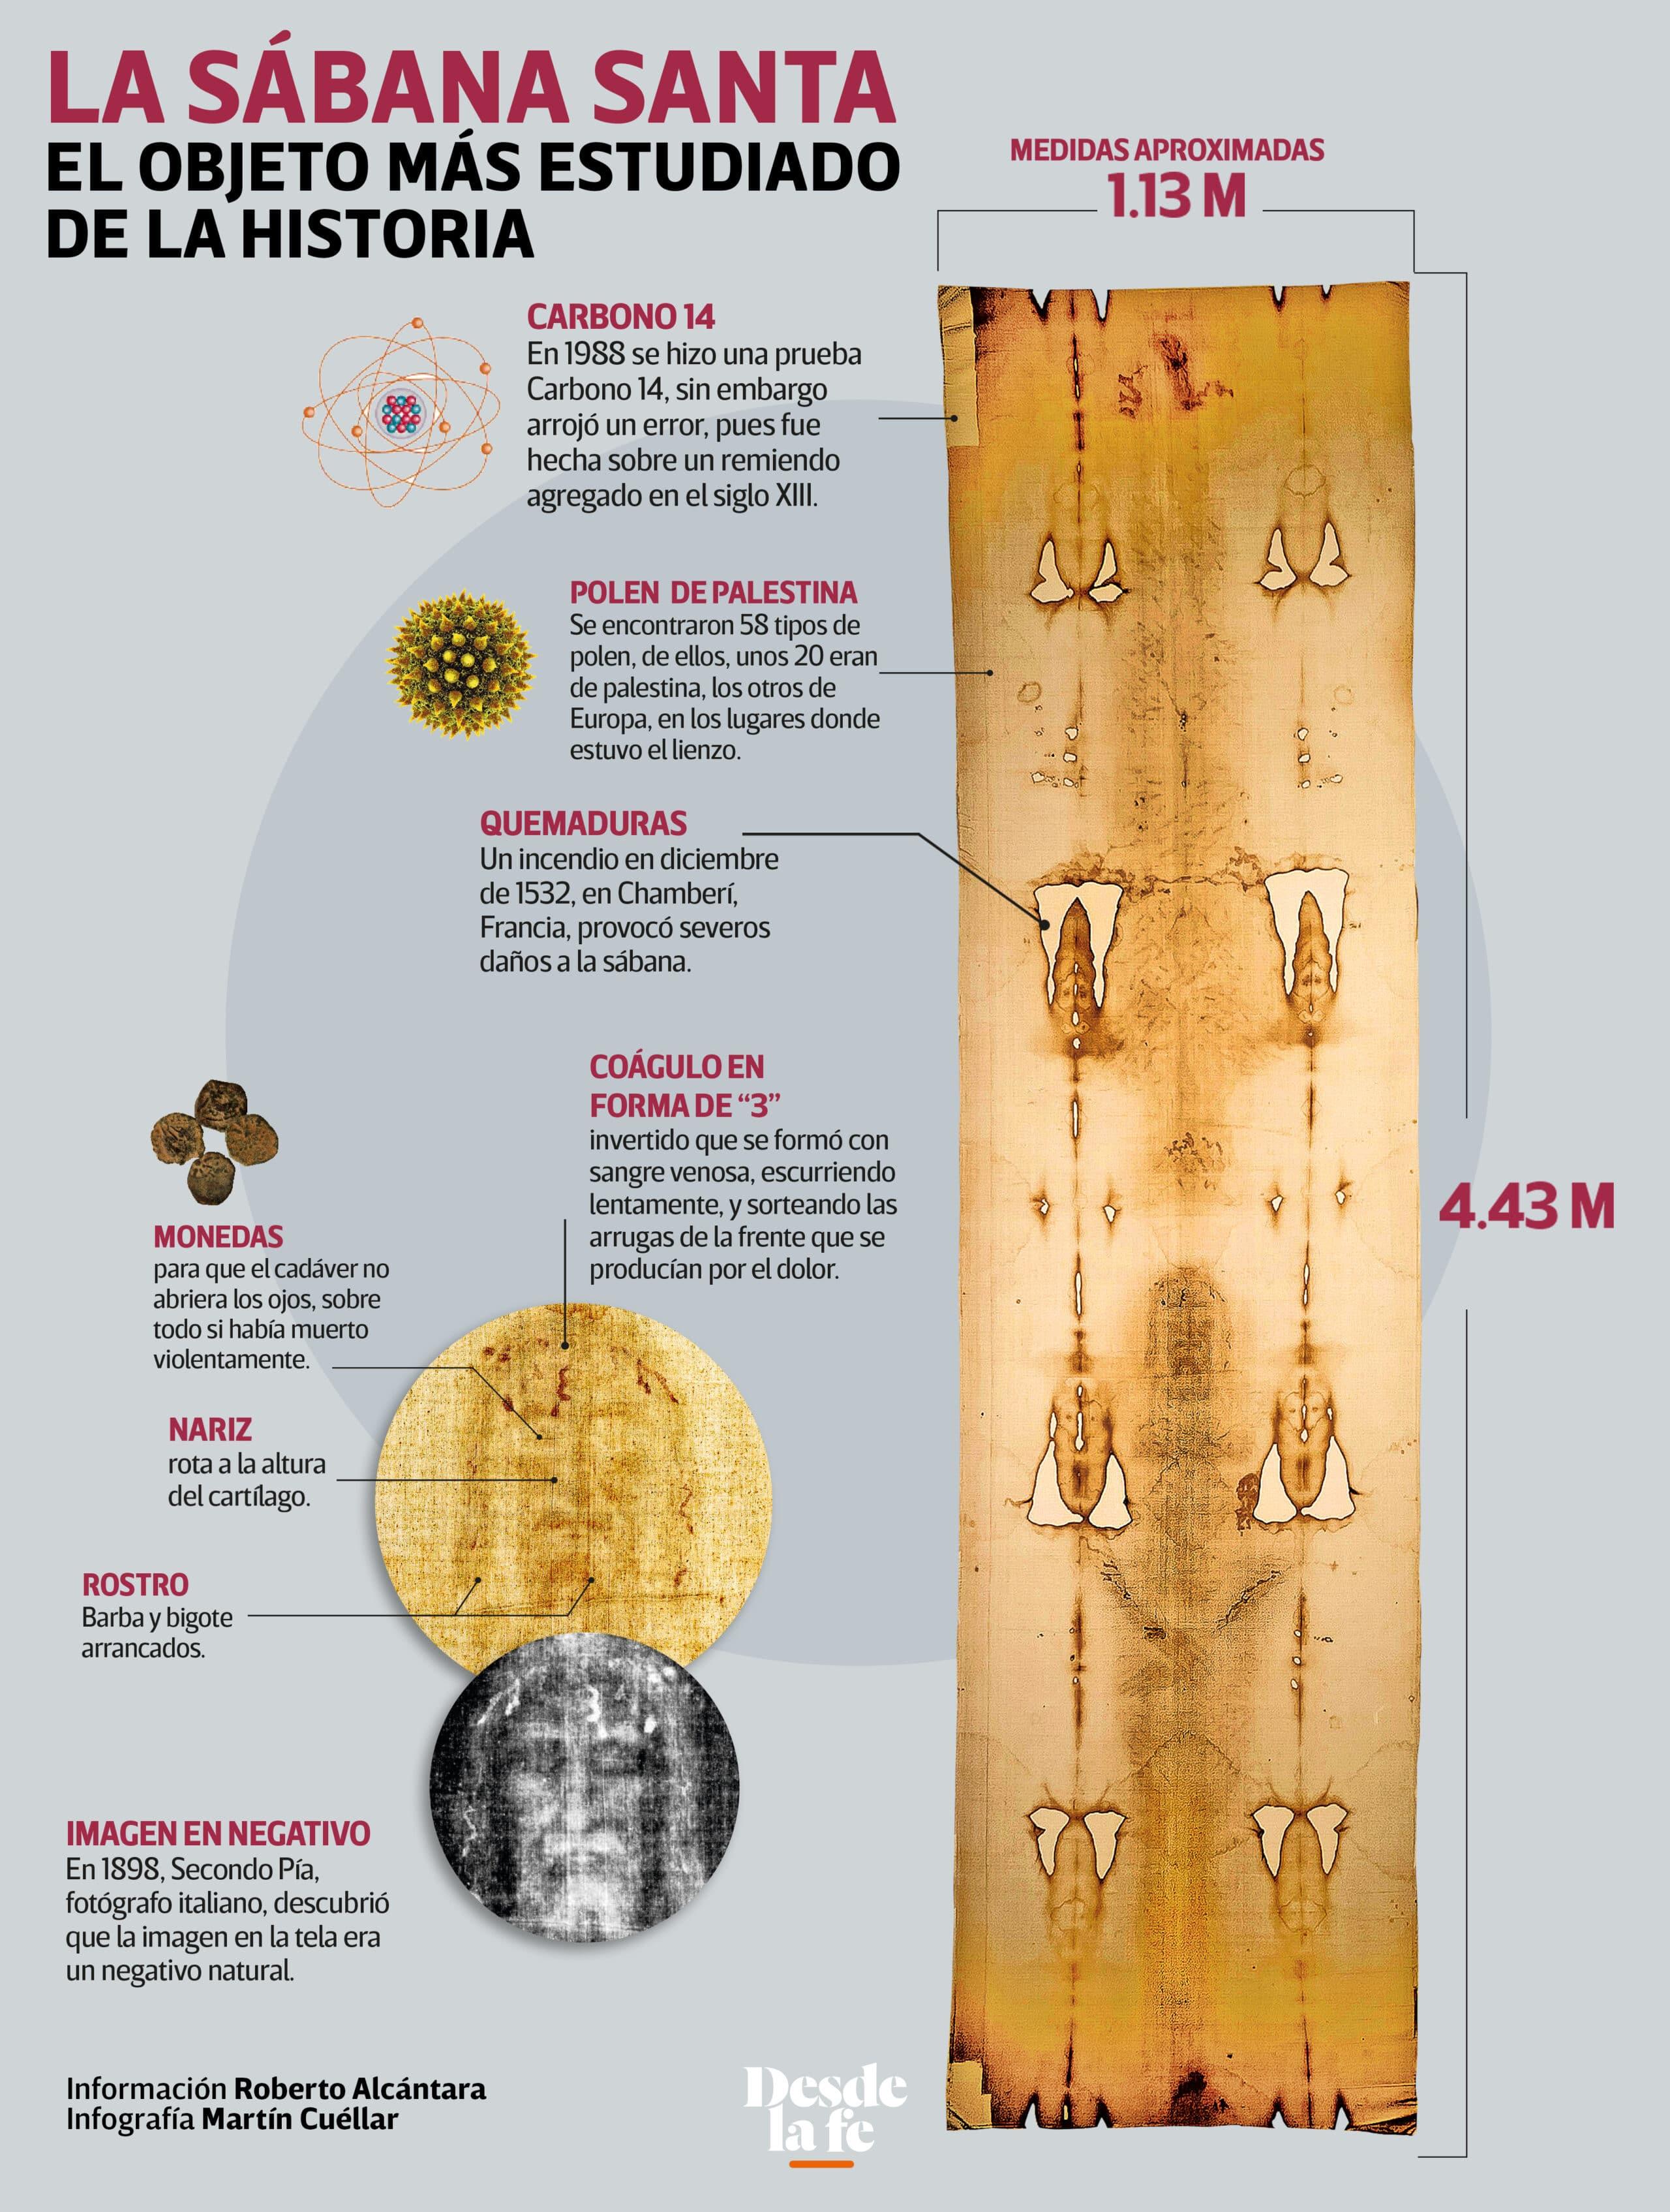 La Sábana Santa. Infografía: Desde la fe.